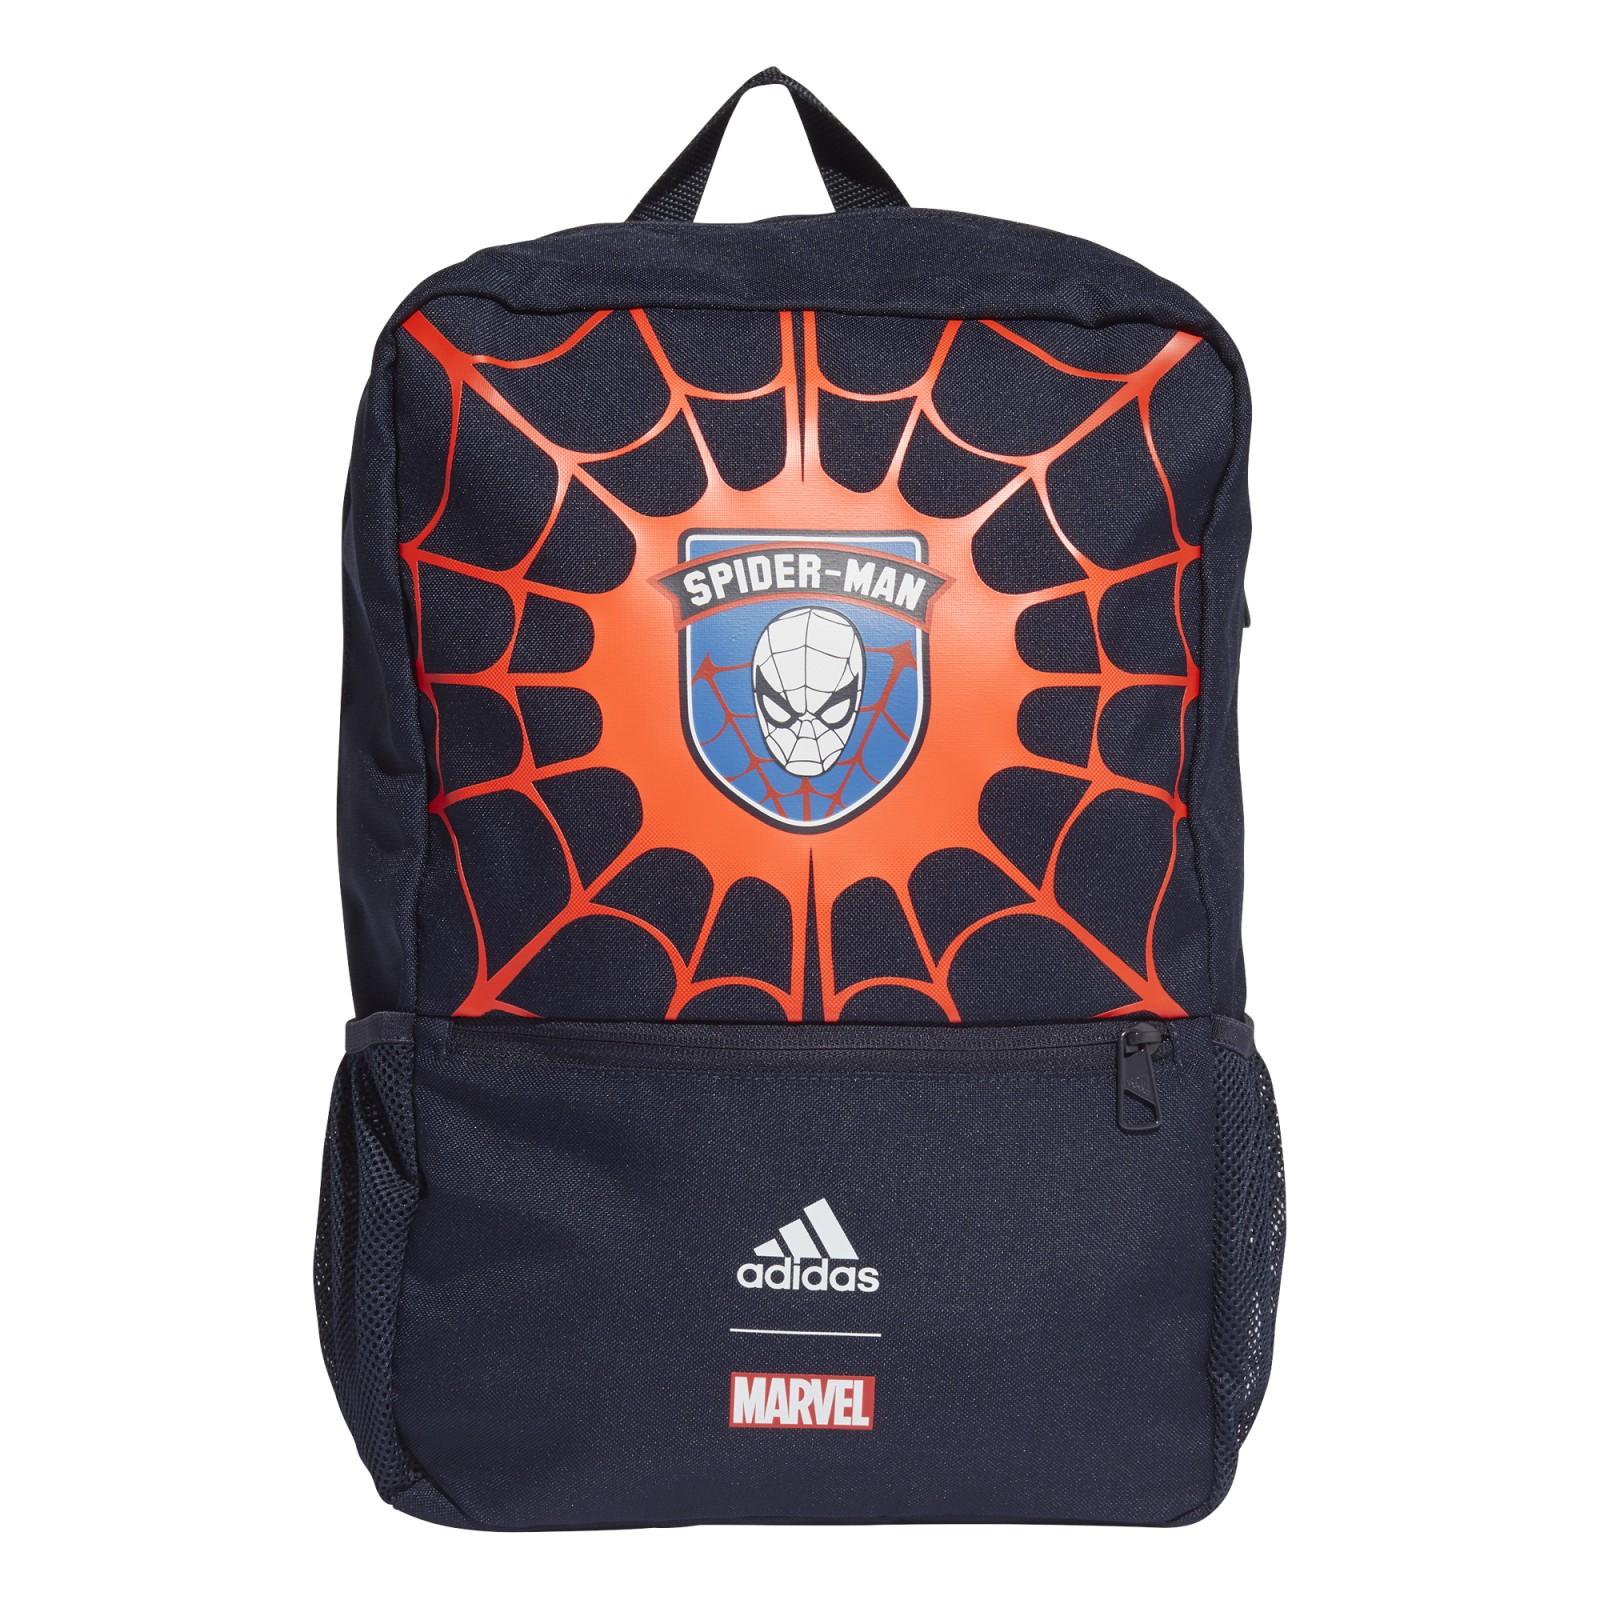 Spiderman bp LEGINK/BORANG